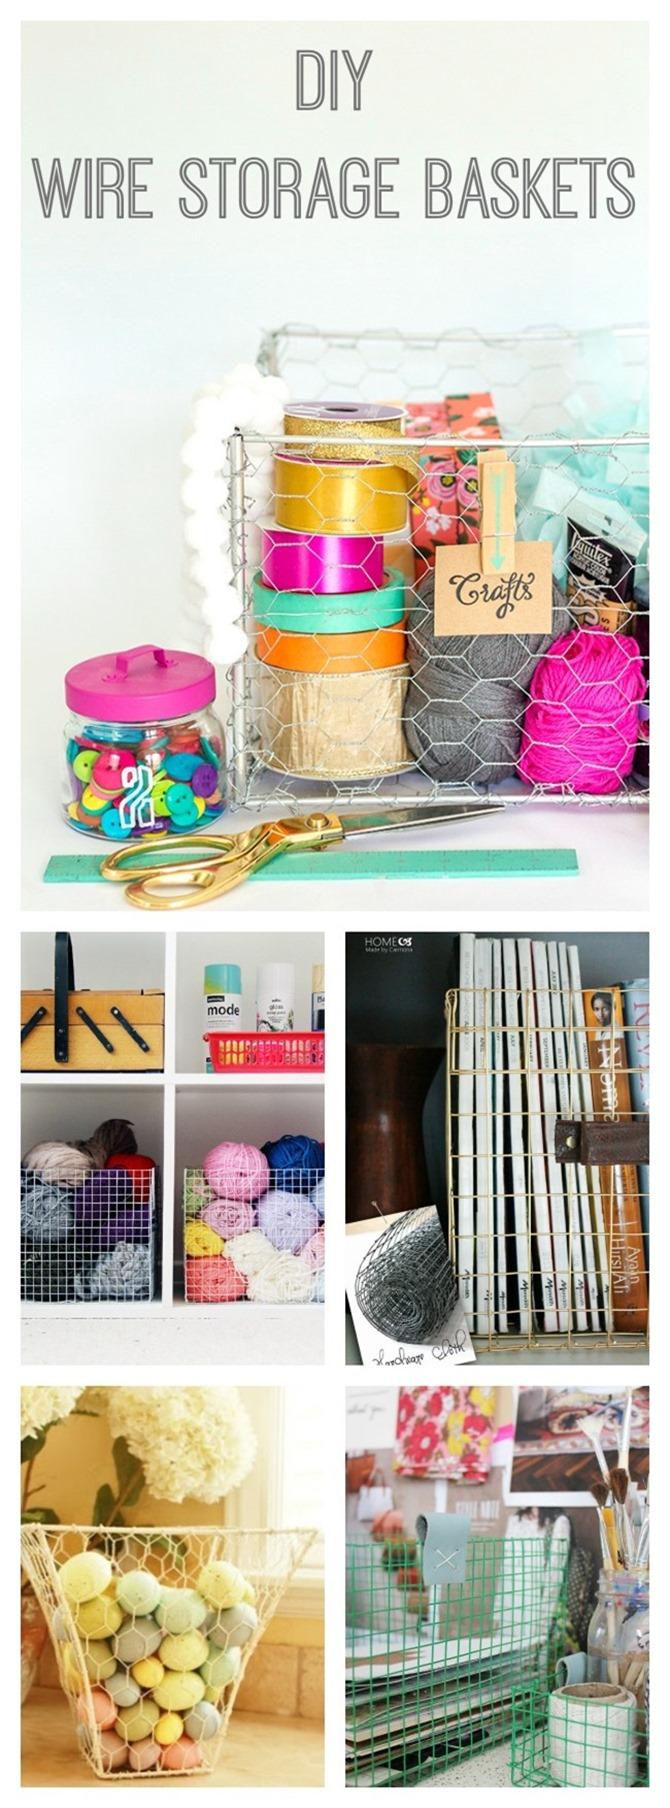 DIY-Wire-Baskets-Craft-Room-Storage-DIY-Organization-EverythingEtsy.com_